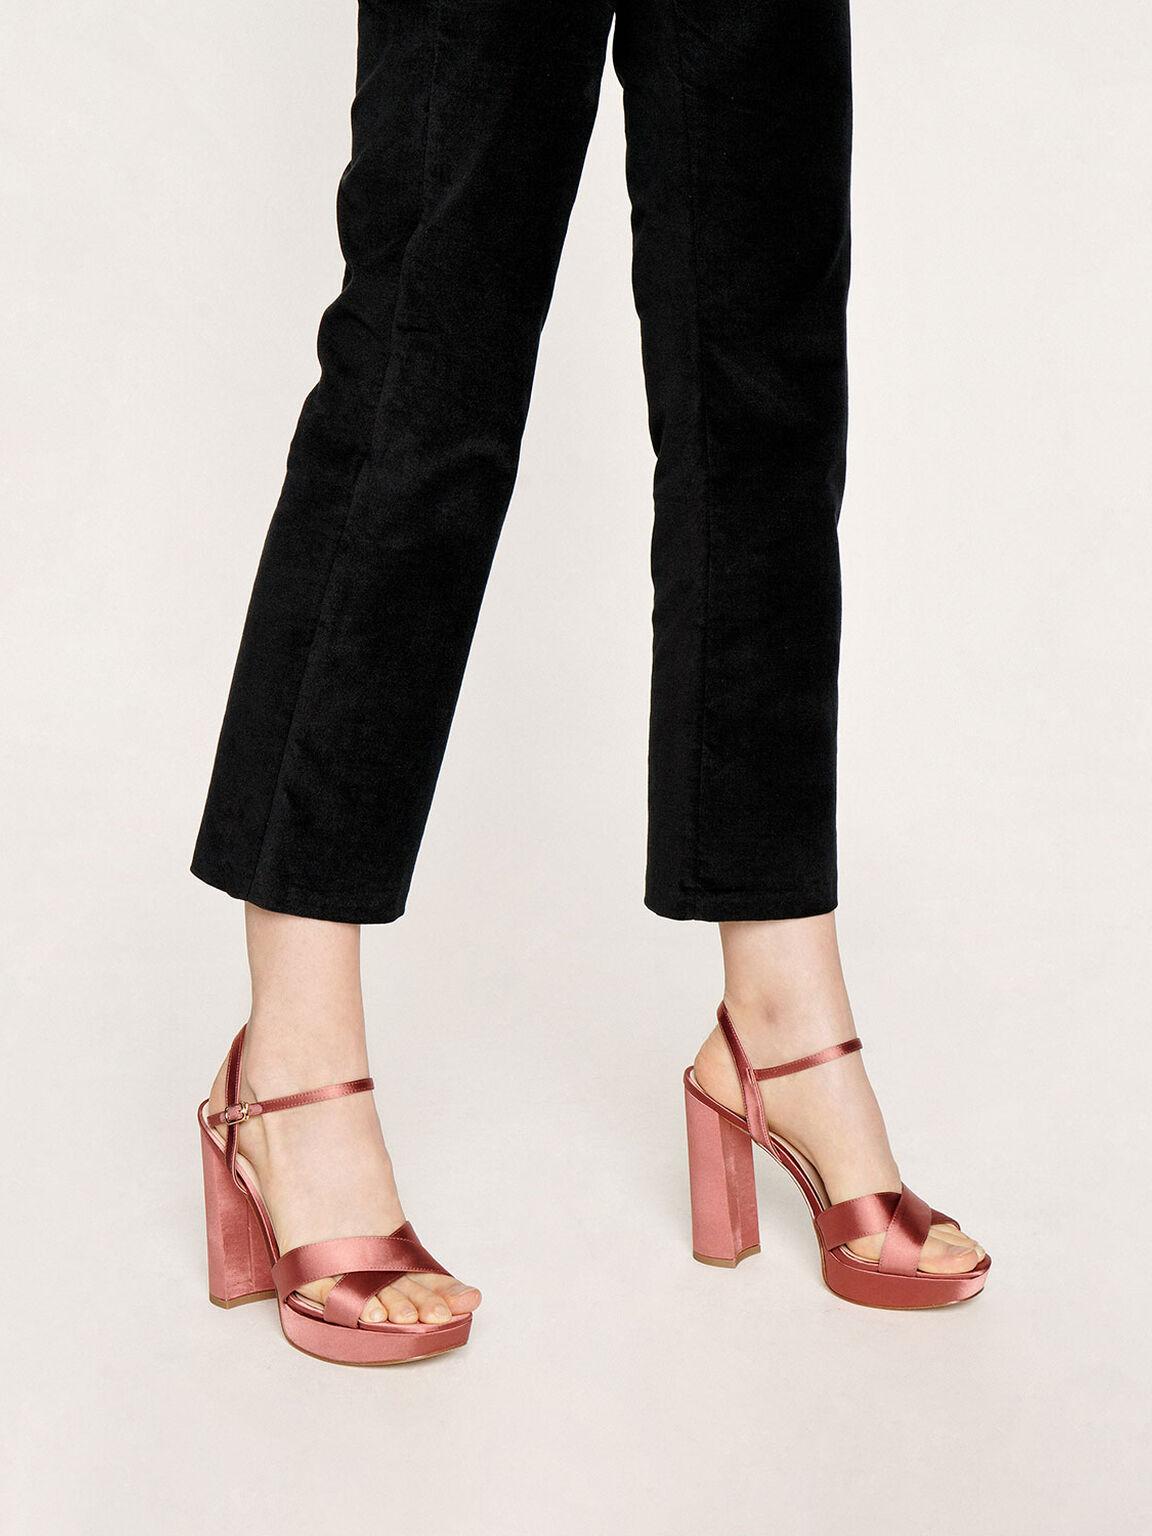 Satin Platform Heels, Pink, hi-res